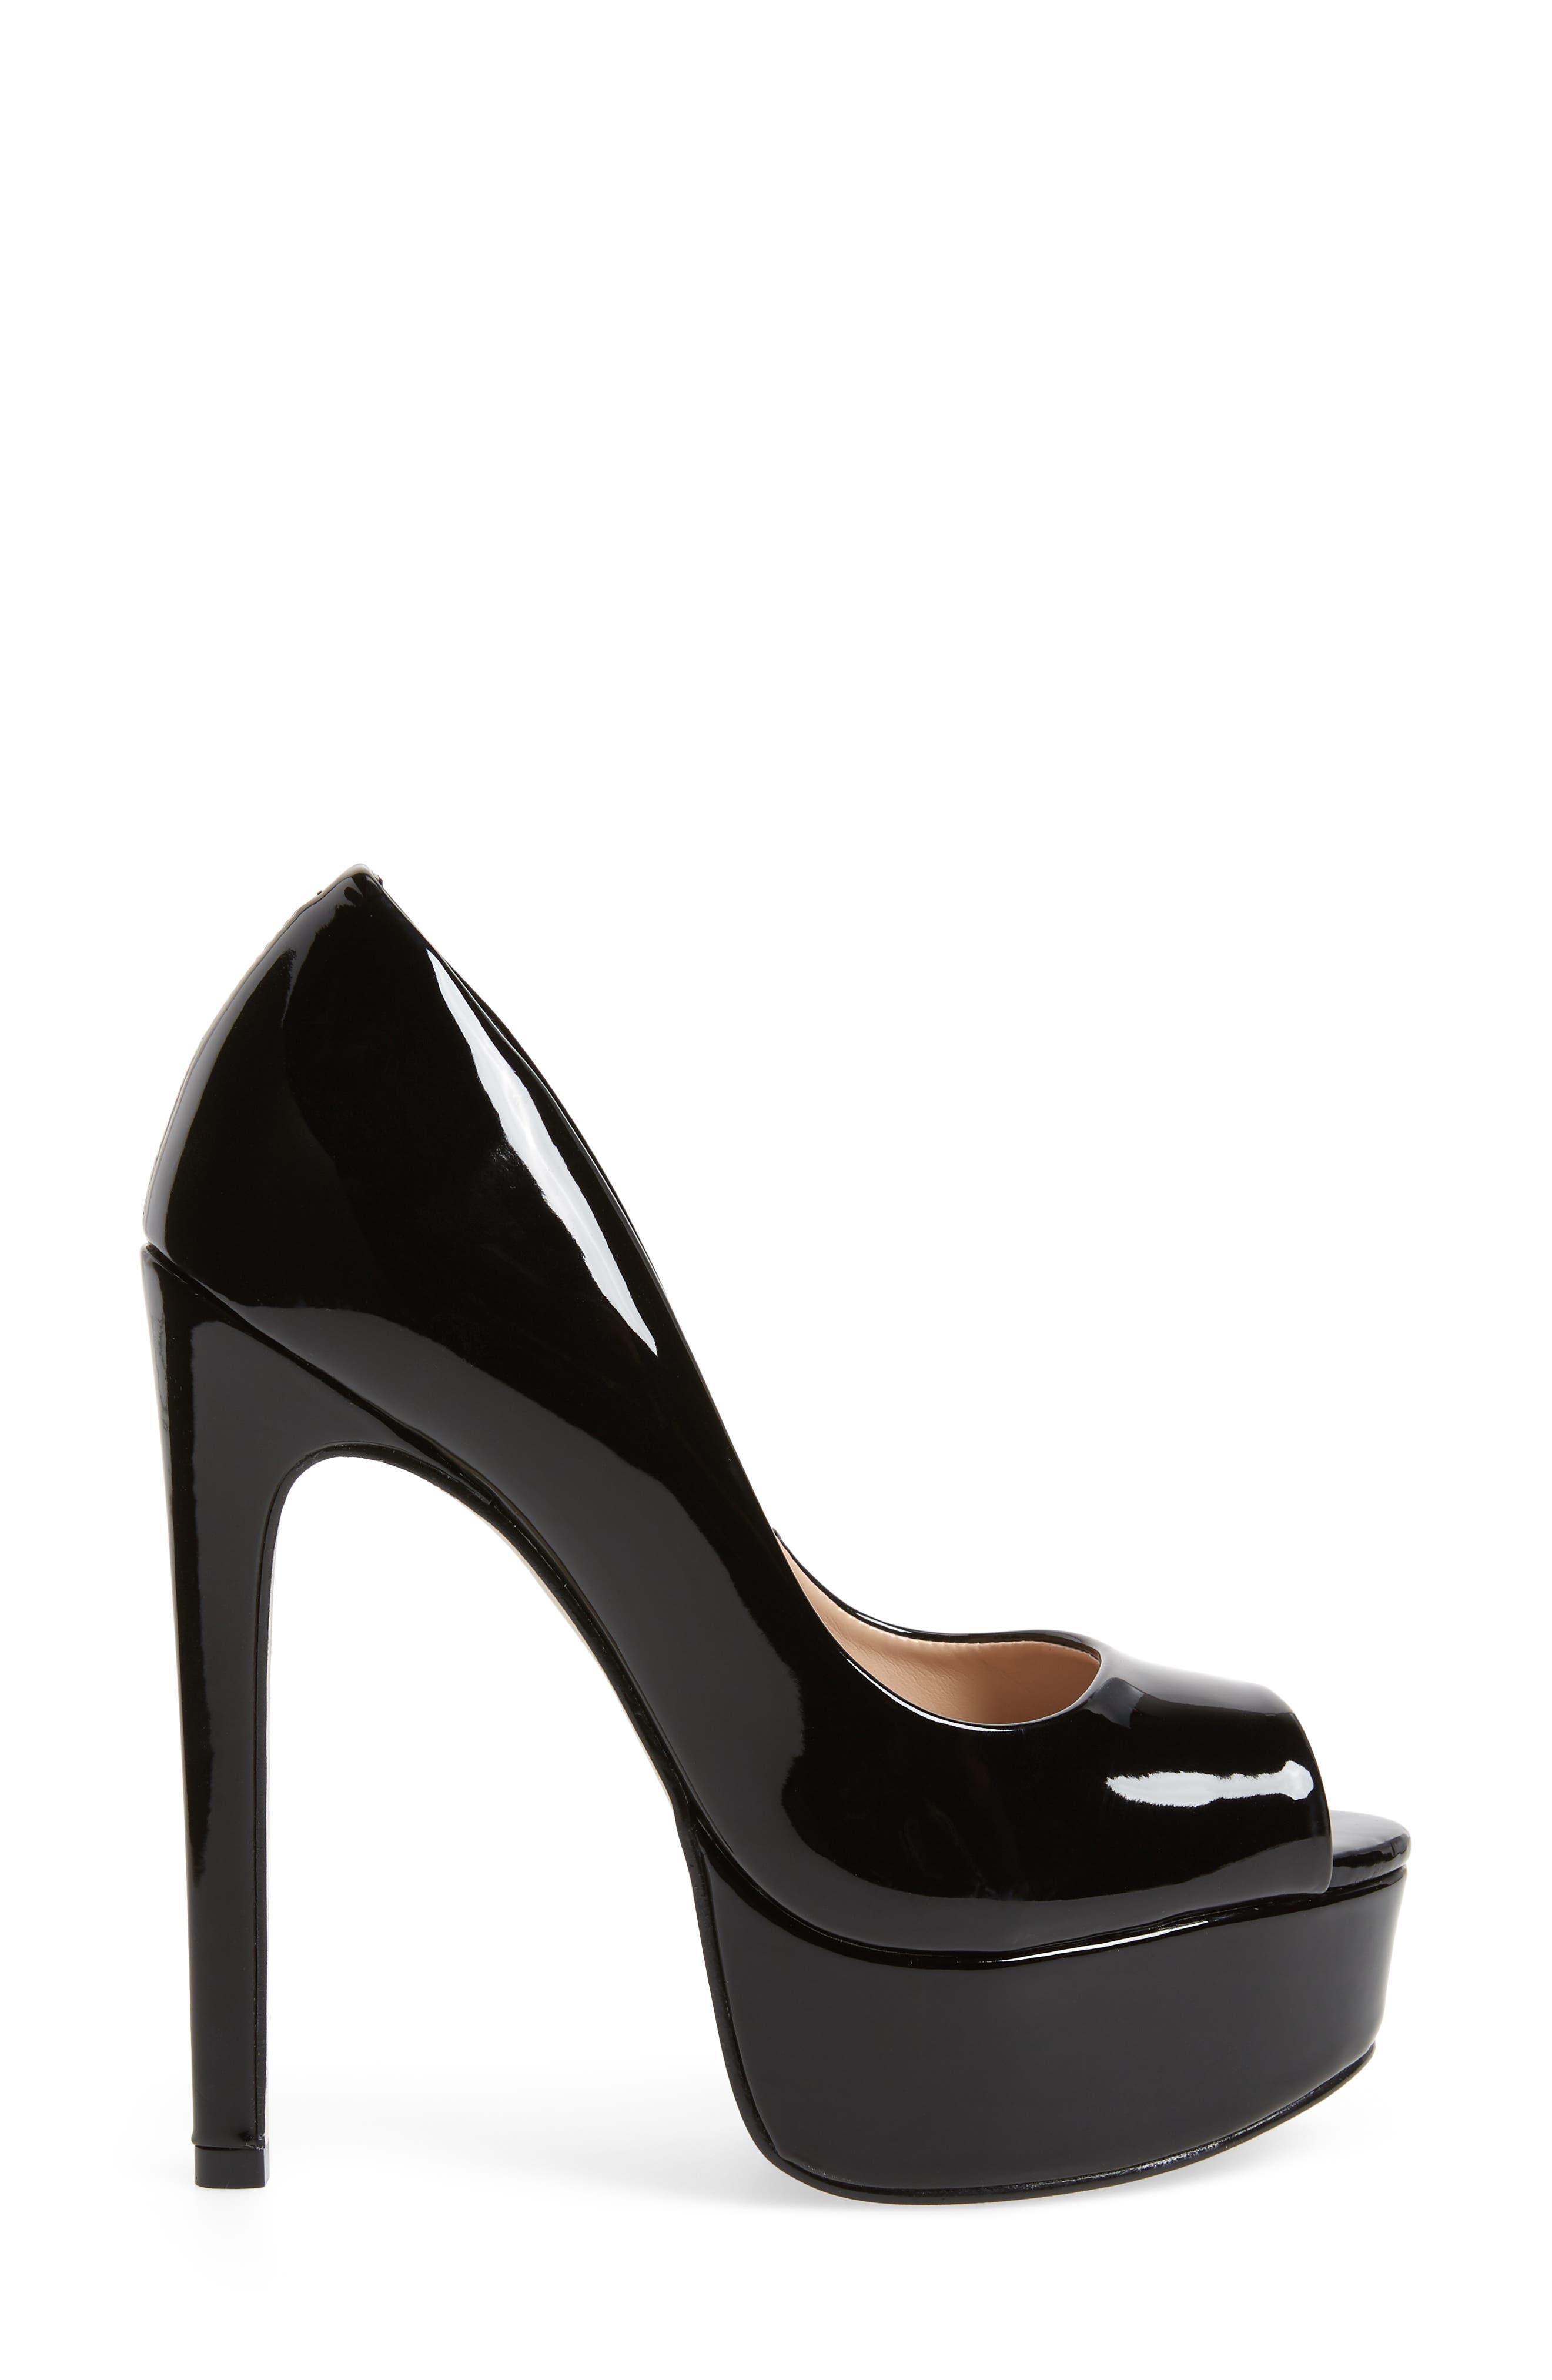 Deanna Platform Sandal,                             Alternate thumbnail 4, color,                             Black Patent